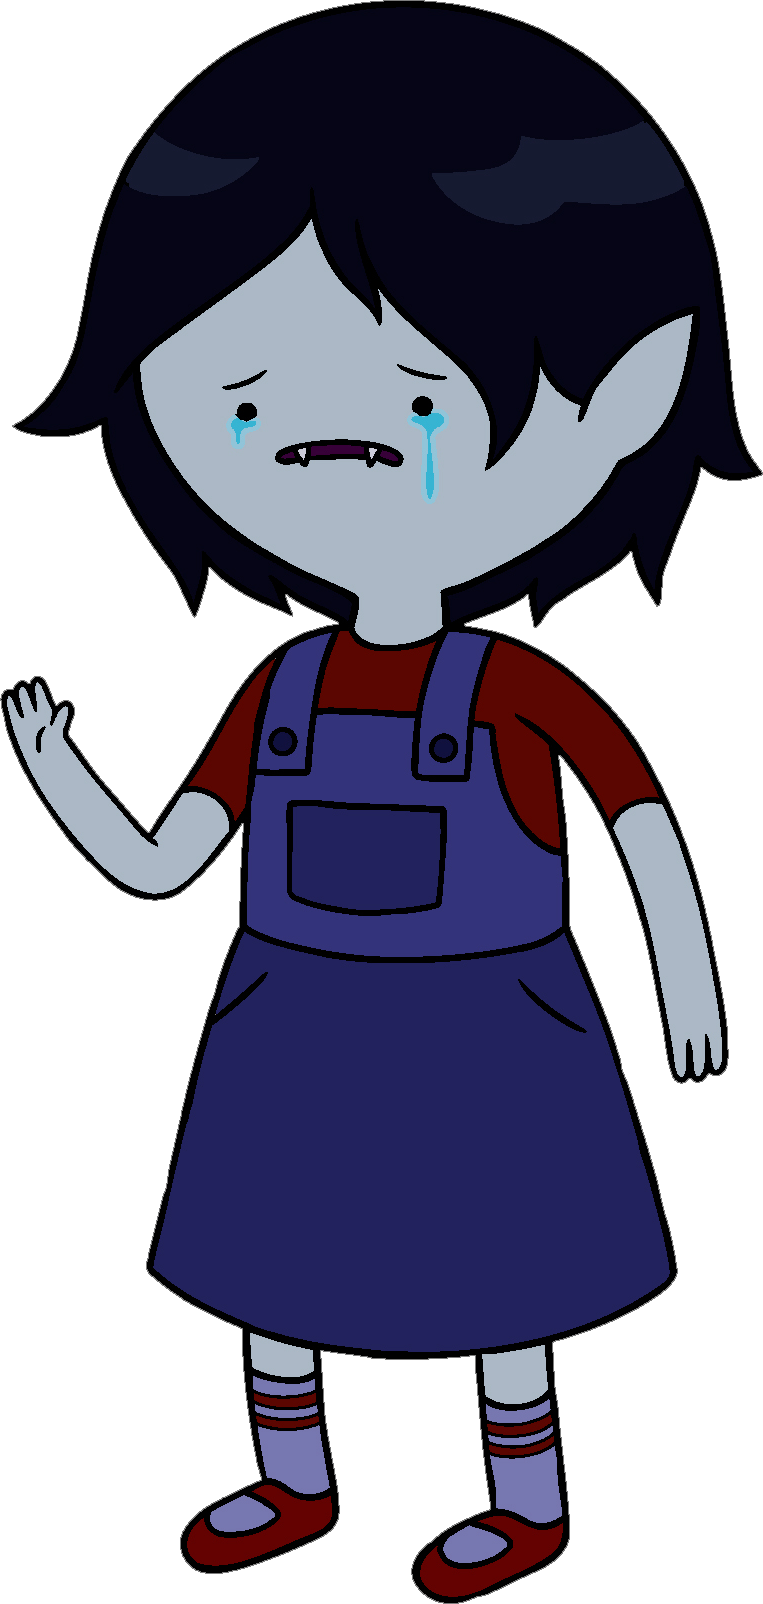 Marceline abadeer time wiki. Footsteps clipart adventure